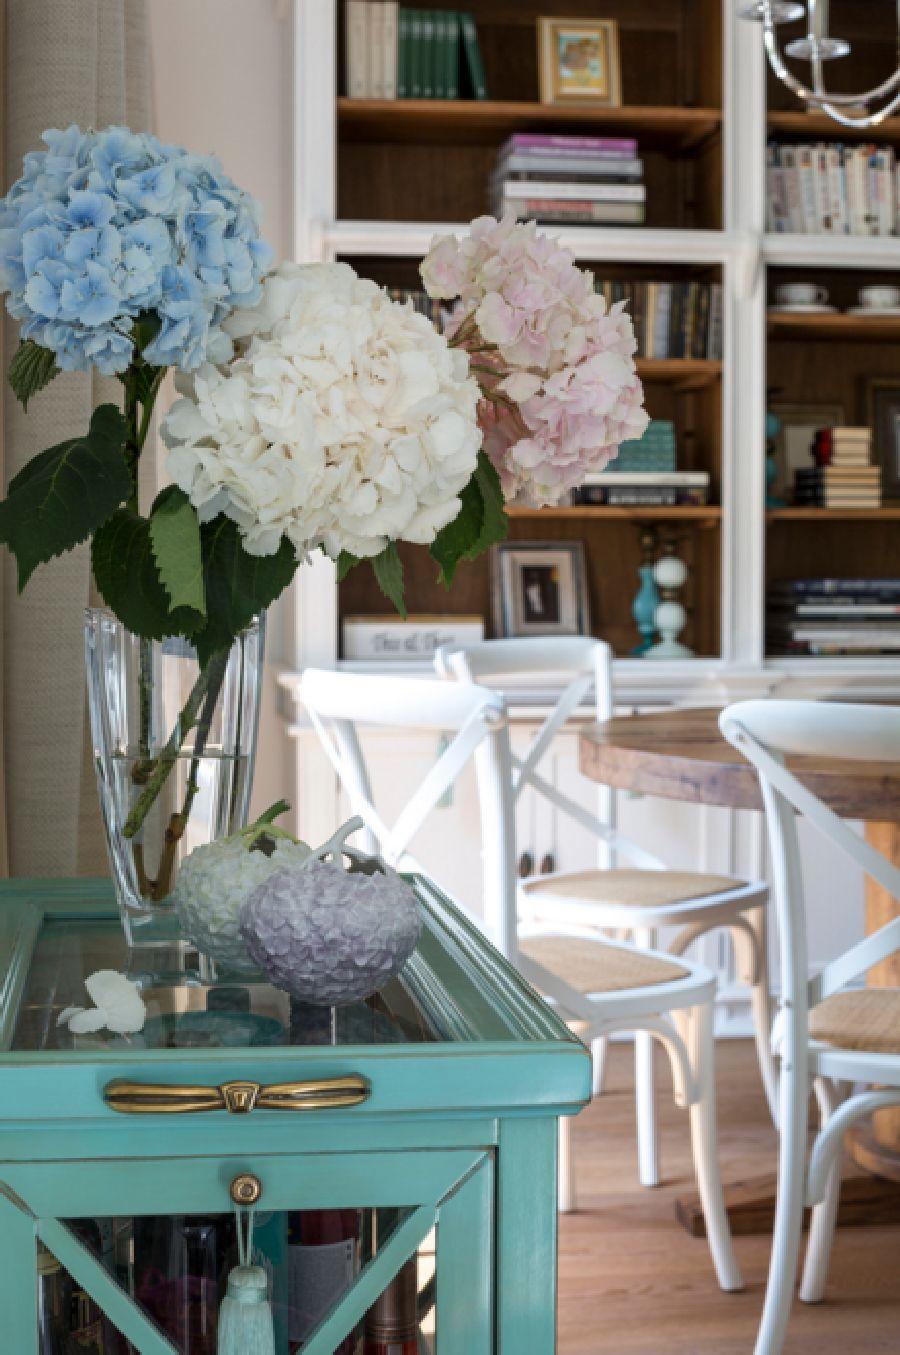 adelaparvu.com despre apartament de 80 mp patrati cu aer rustic elegant, locuinta Rusia, designer Zhenya Zhdanova (4)